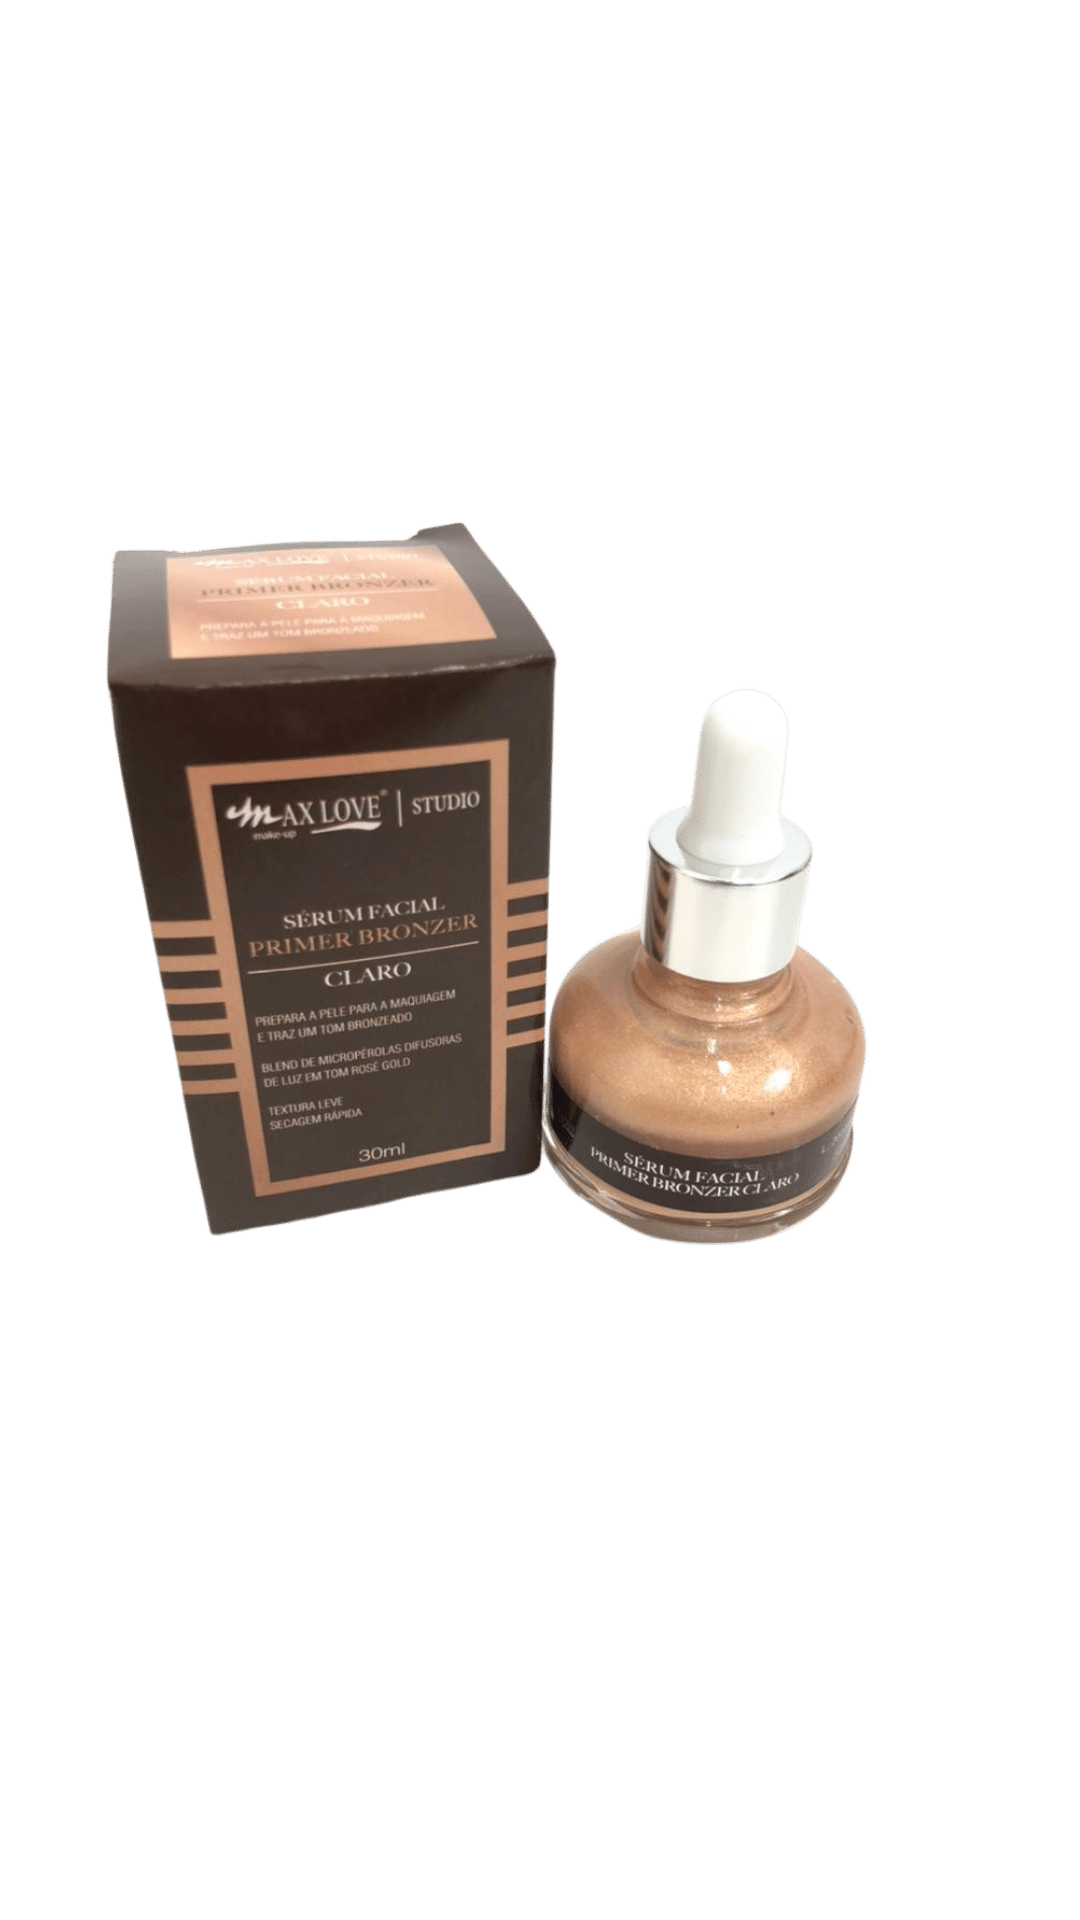 Sérum Facial Primer  Bronzer Claro - Max Love